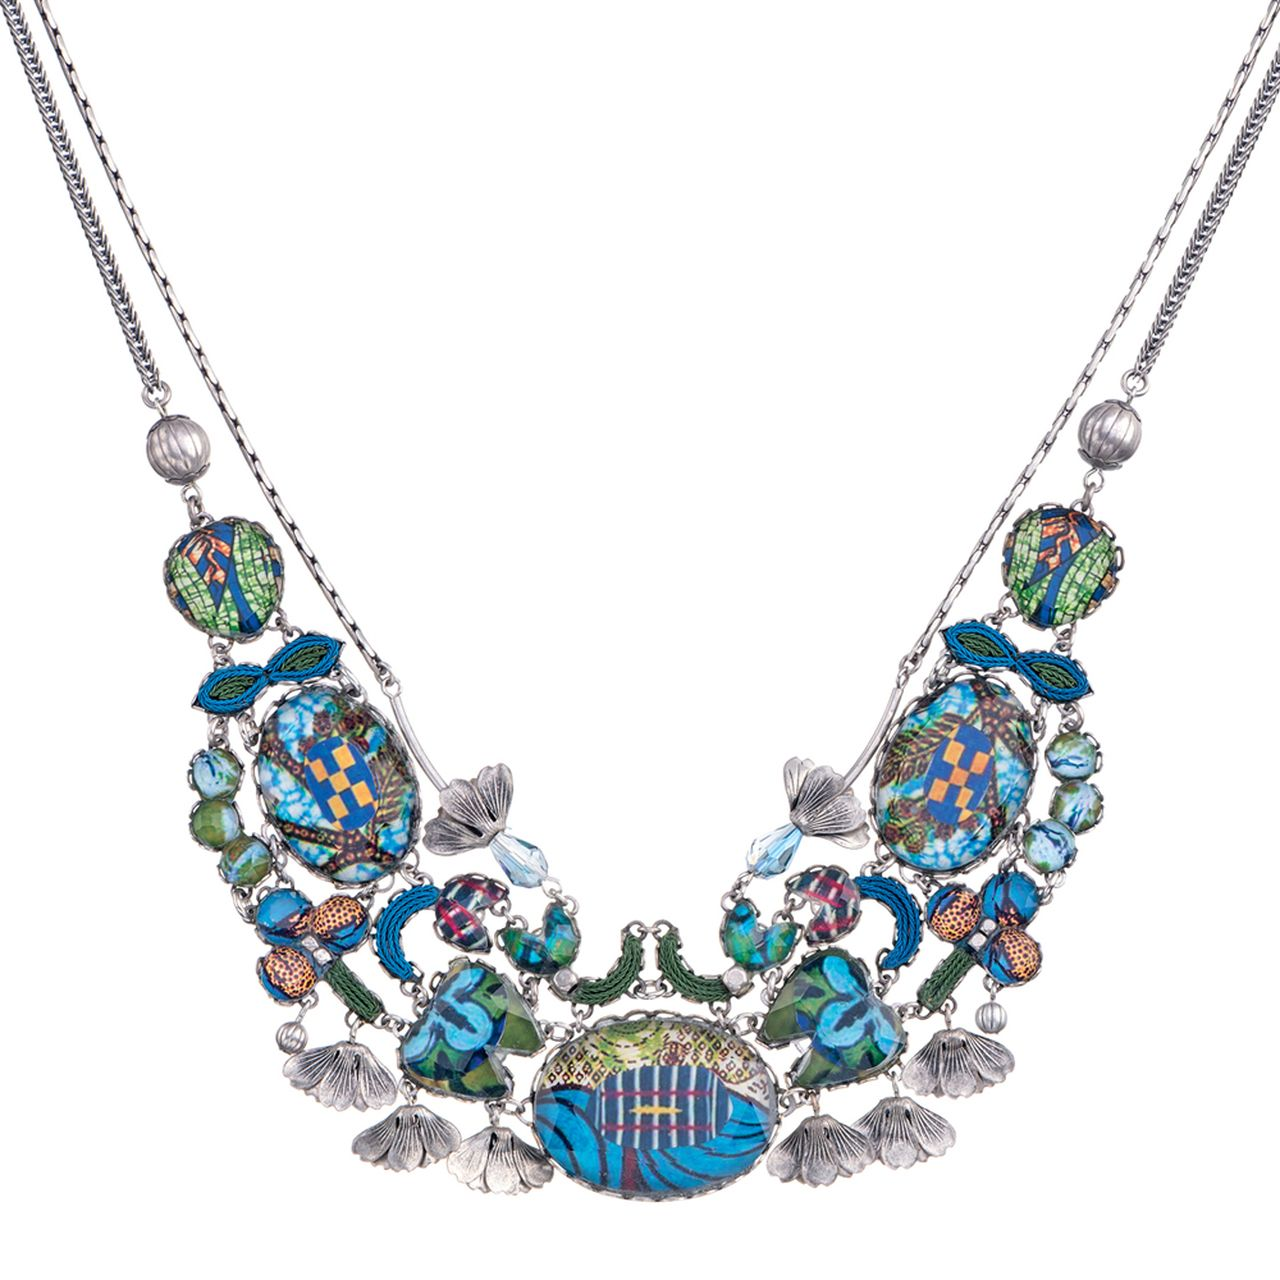 Ayala Bar Space Ritual Journey Necklace Journey Necklace